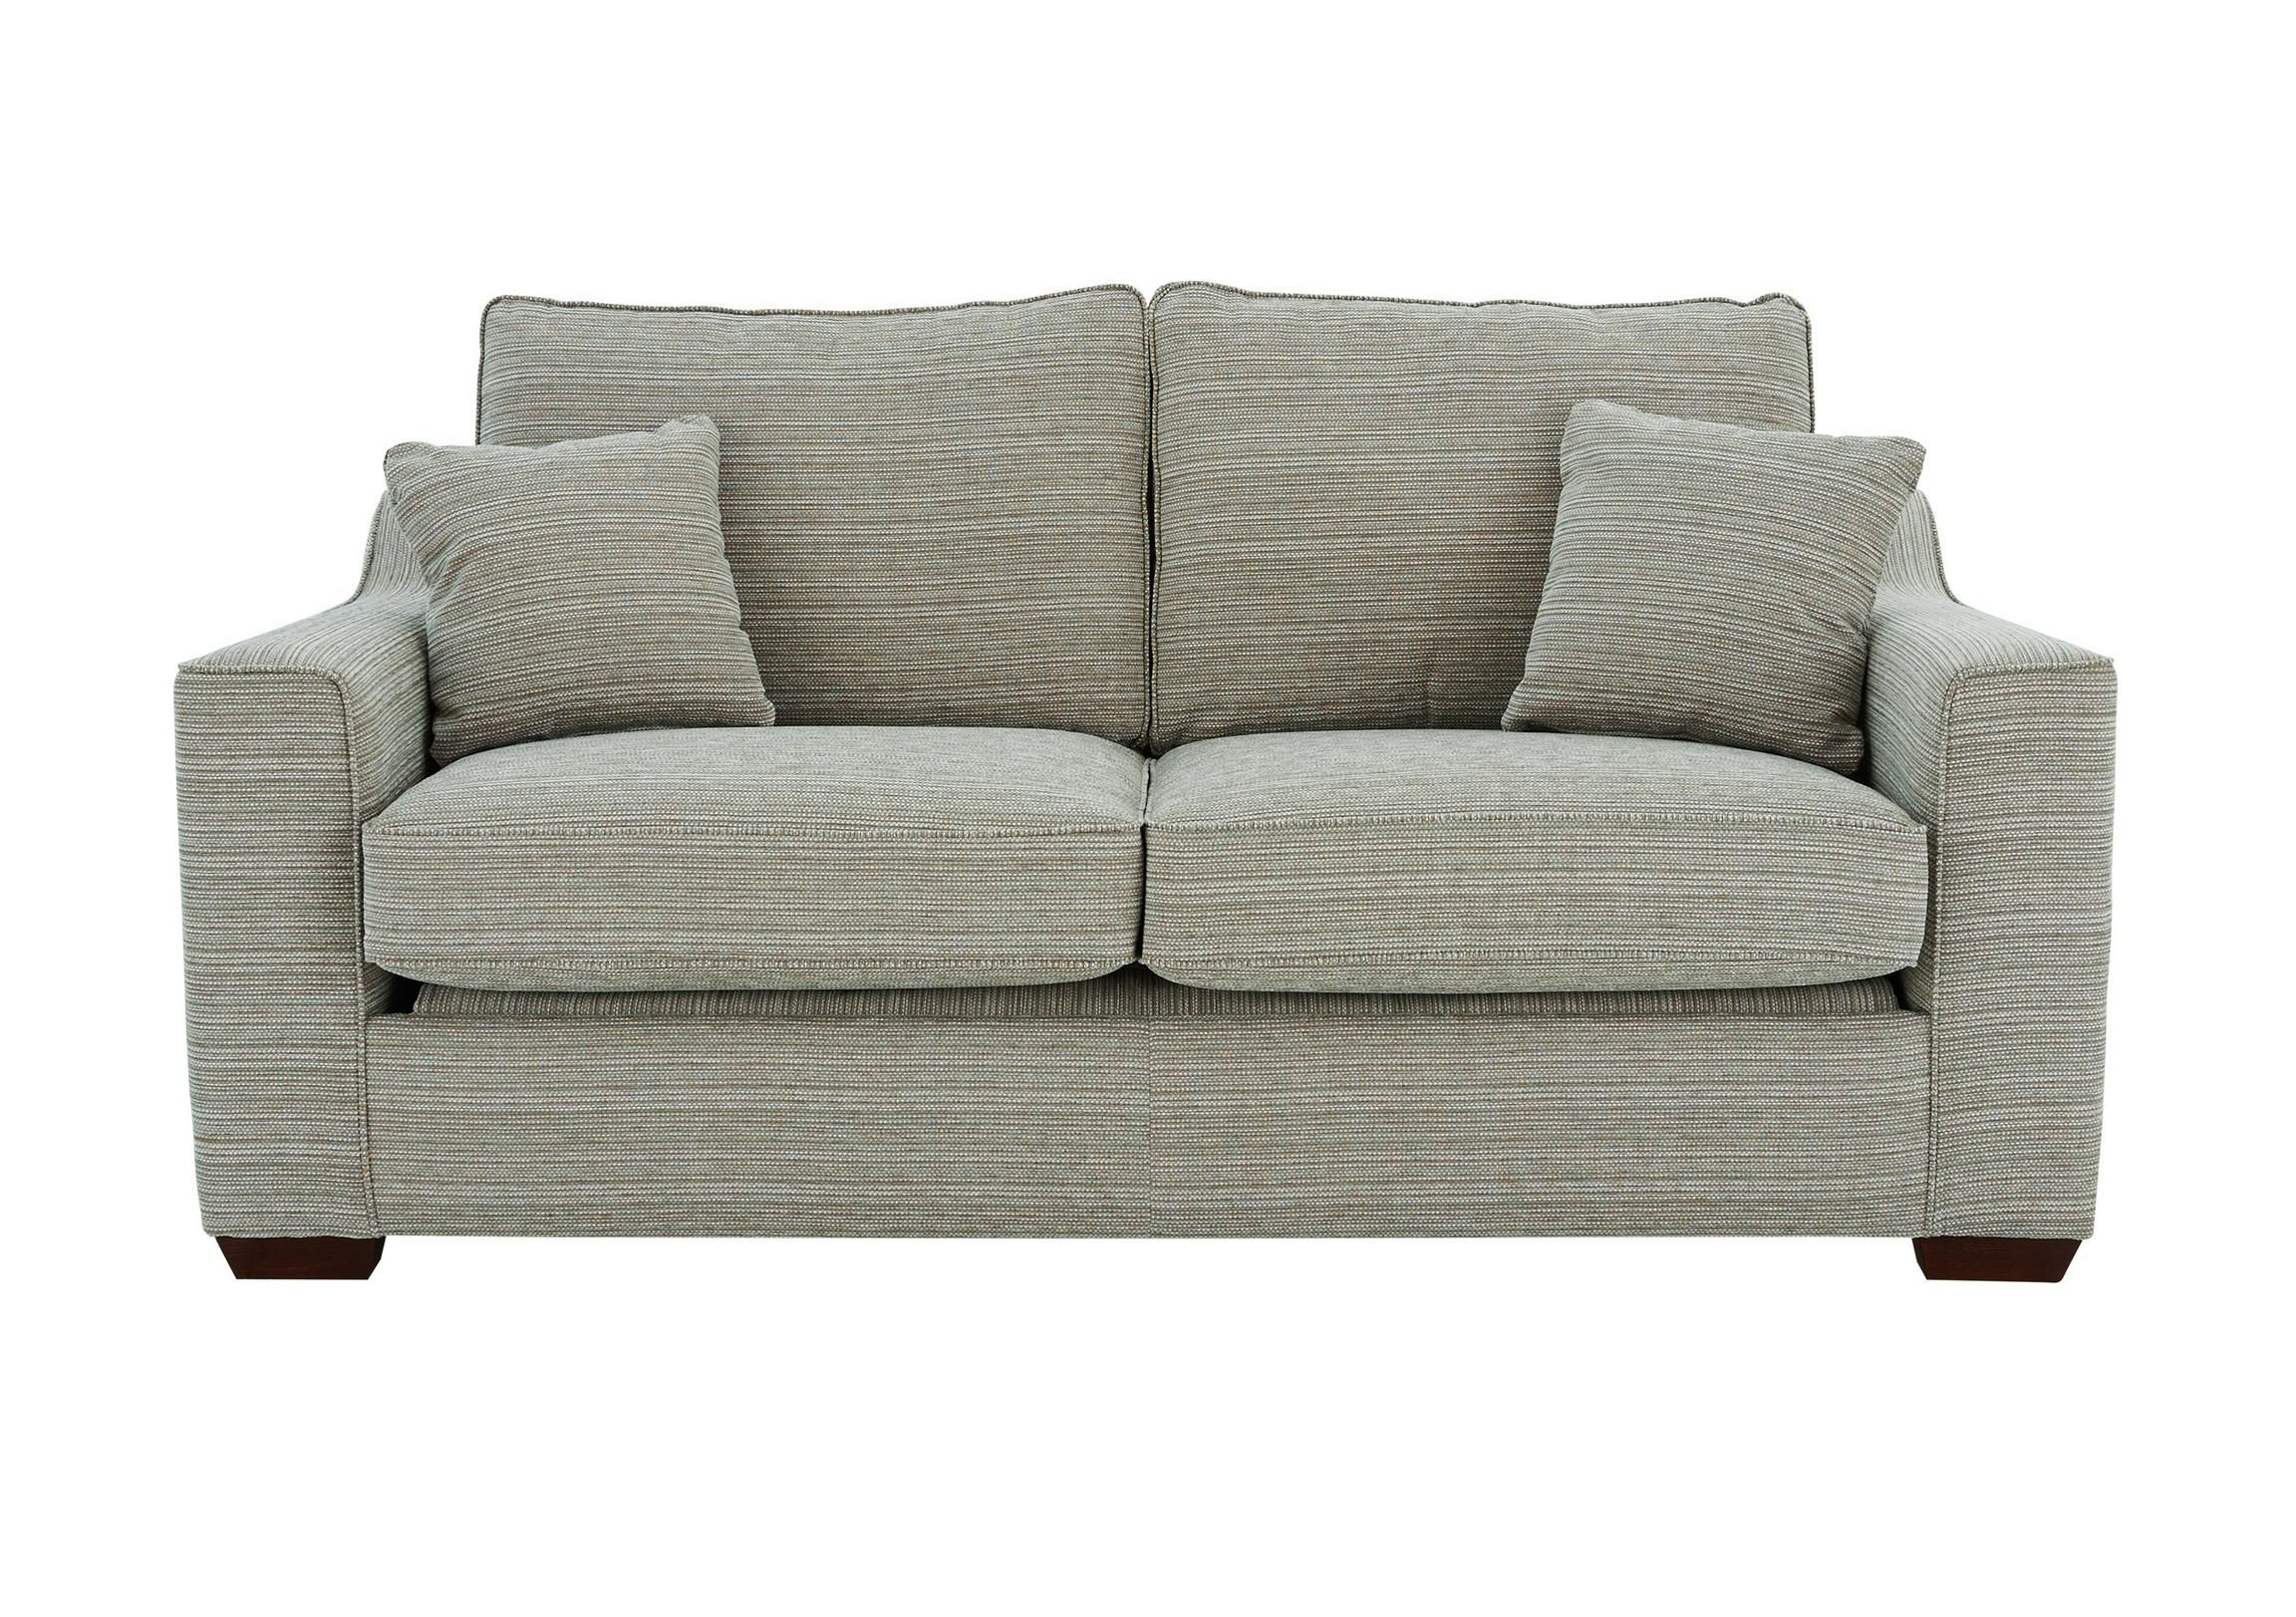 Las Vegas 2 Seater Fabric Sofa Bed